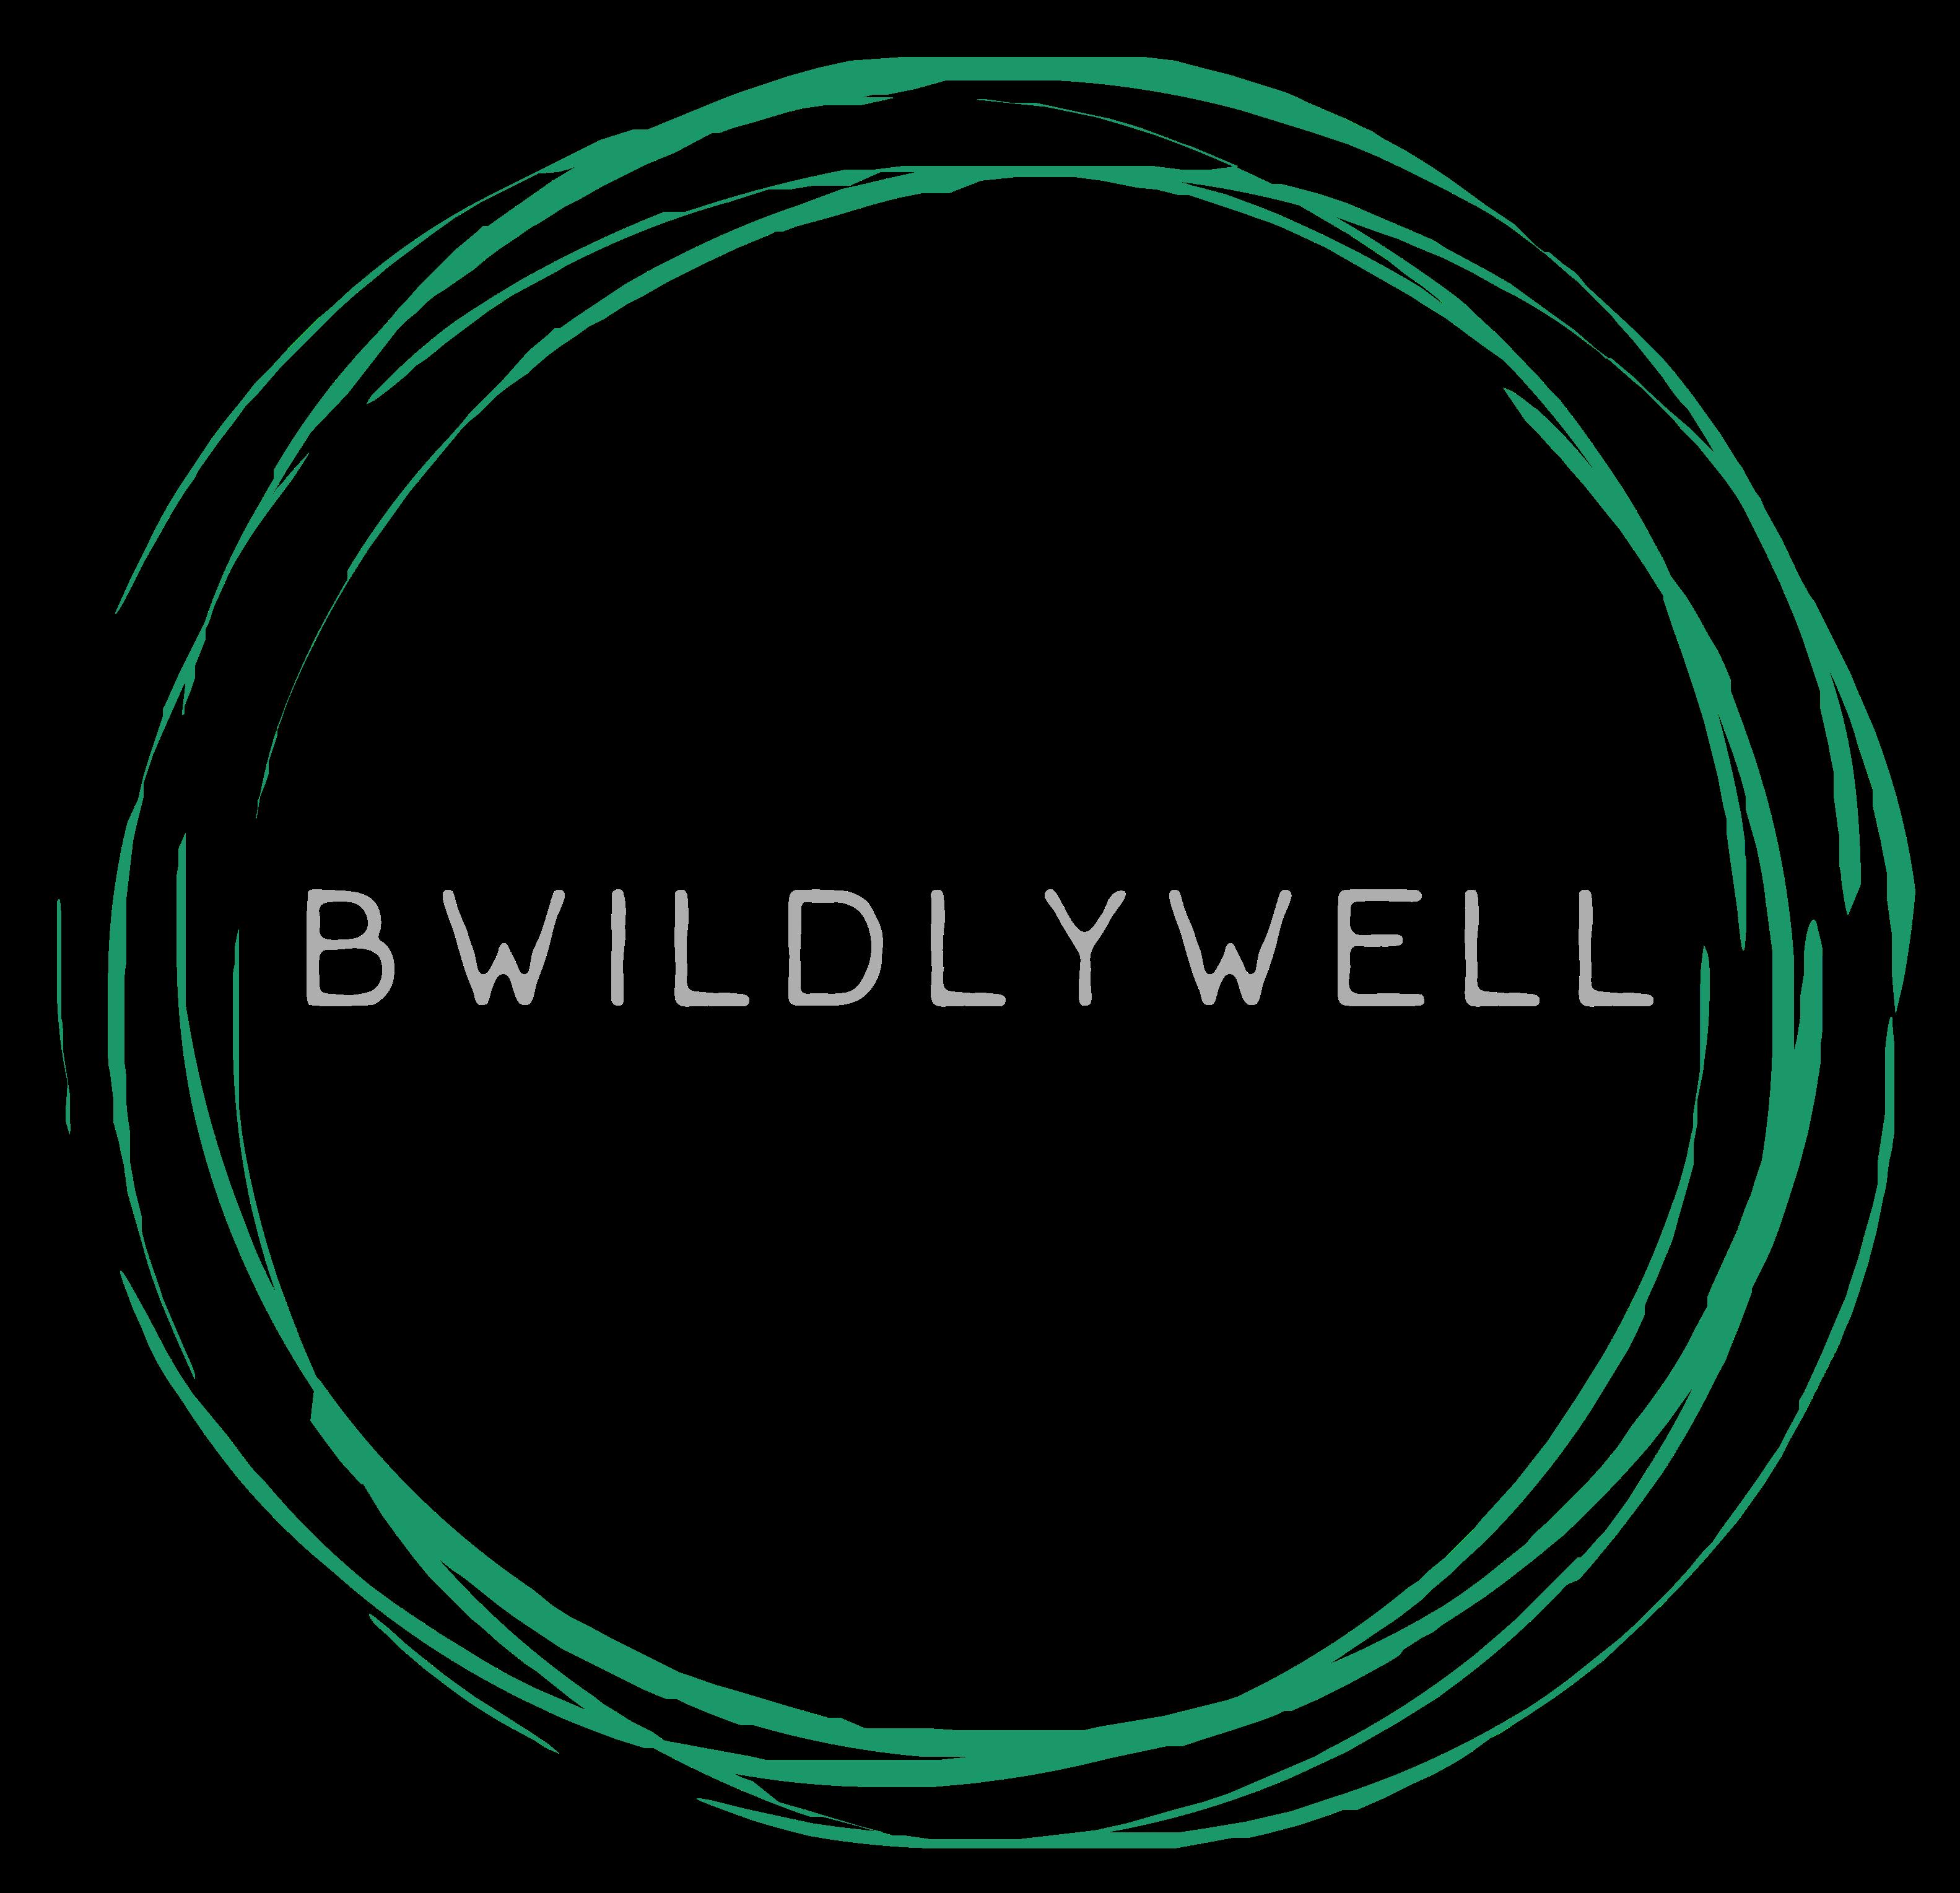 BWildlyWell